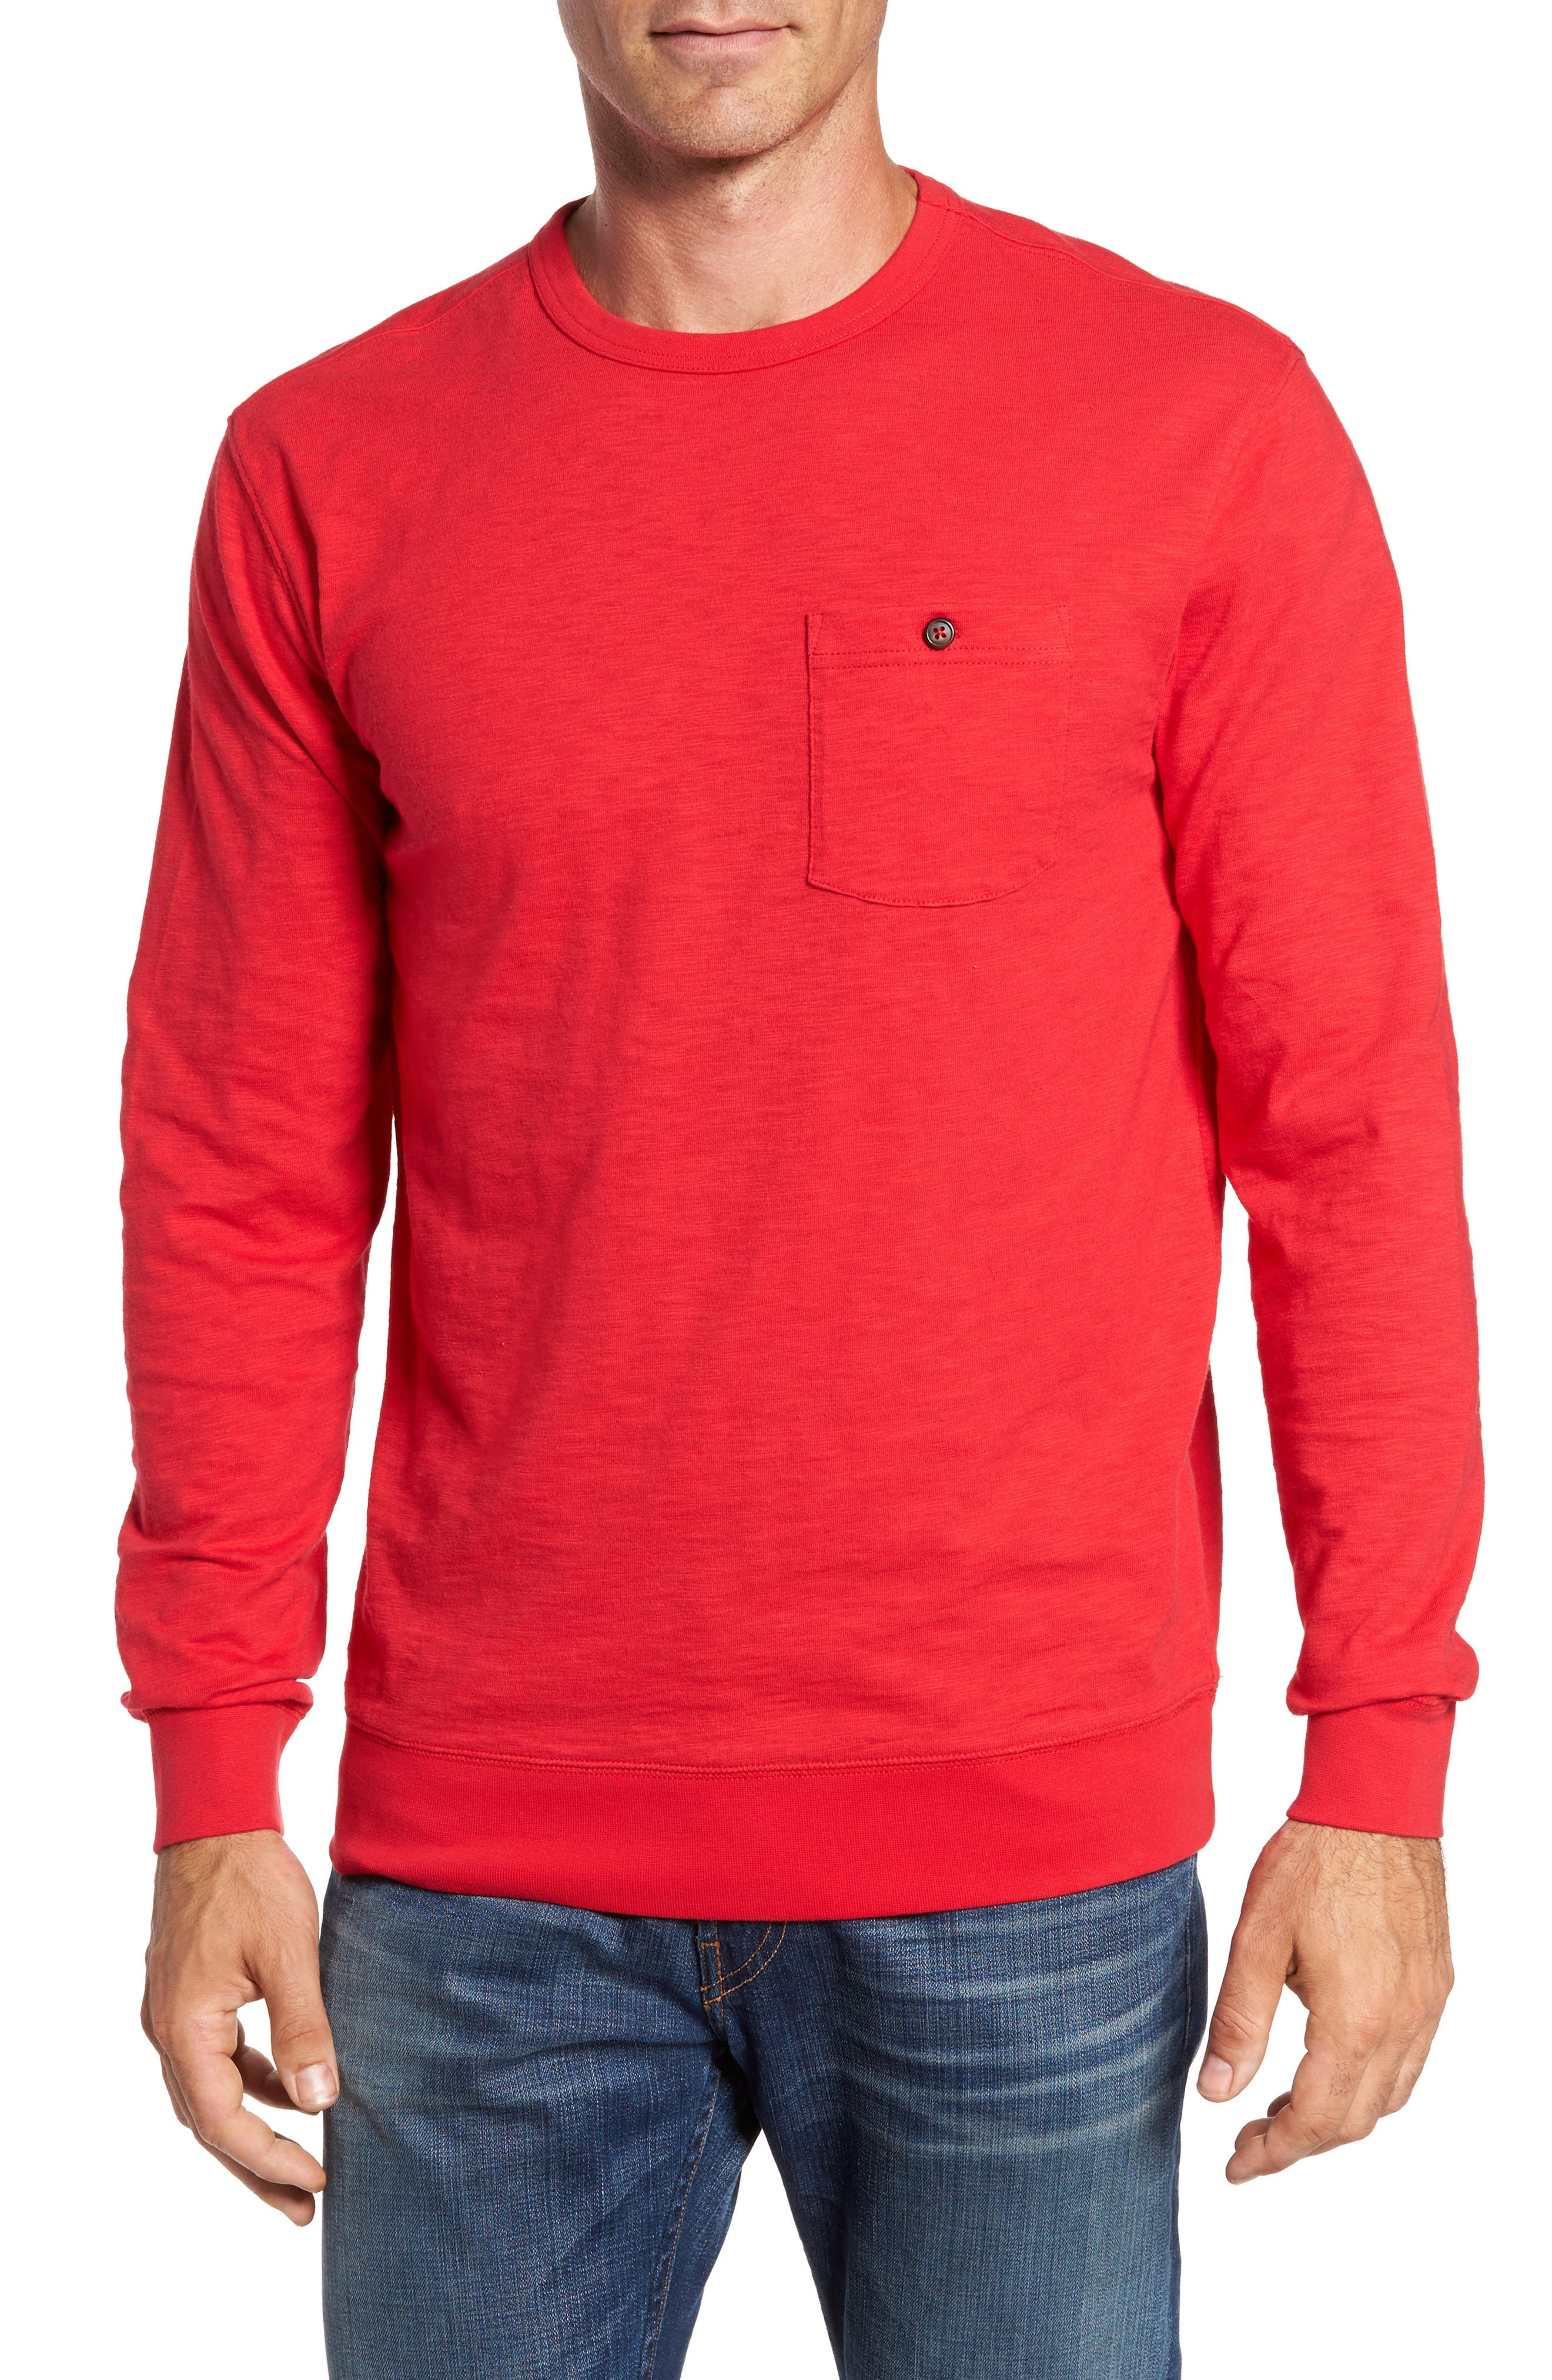 Southern Tide Montford Slub Pocket T-Shirt